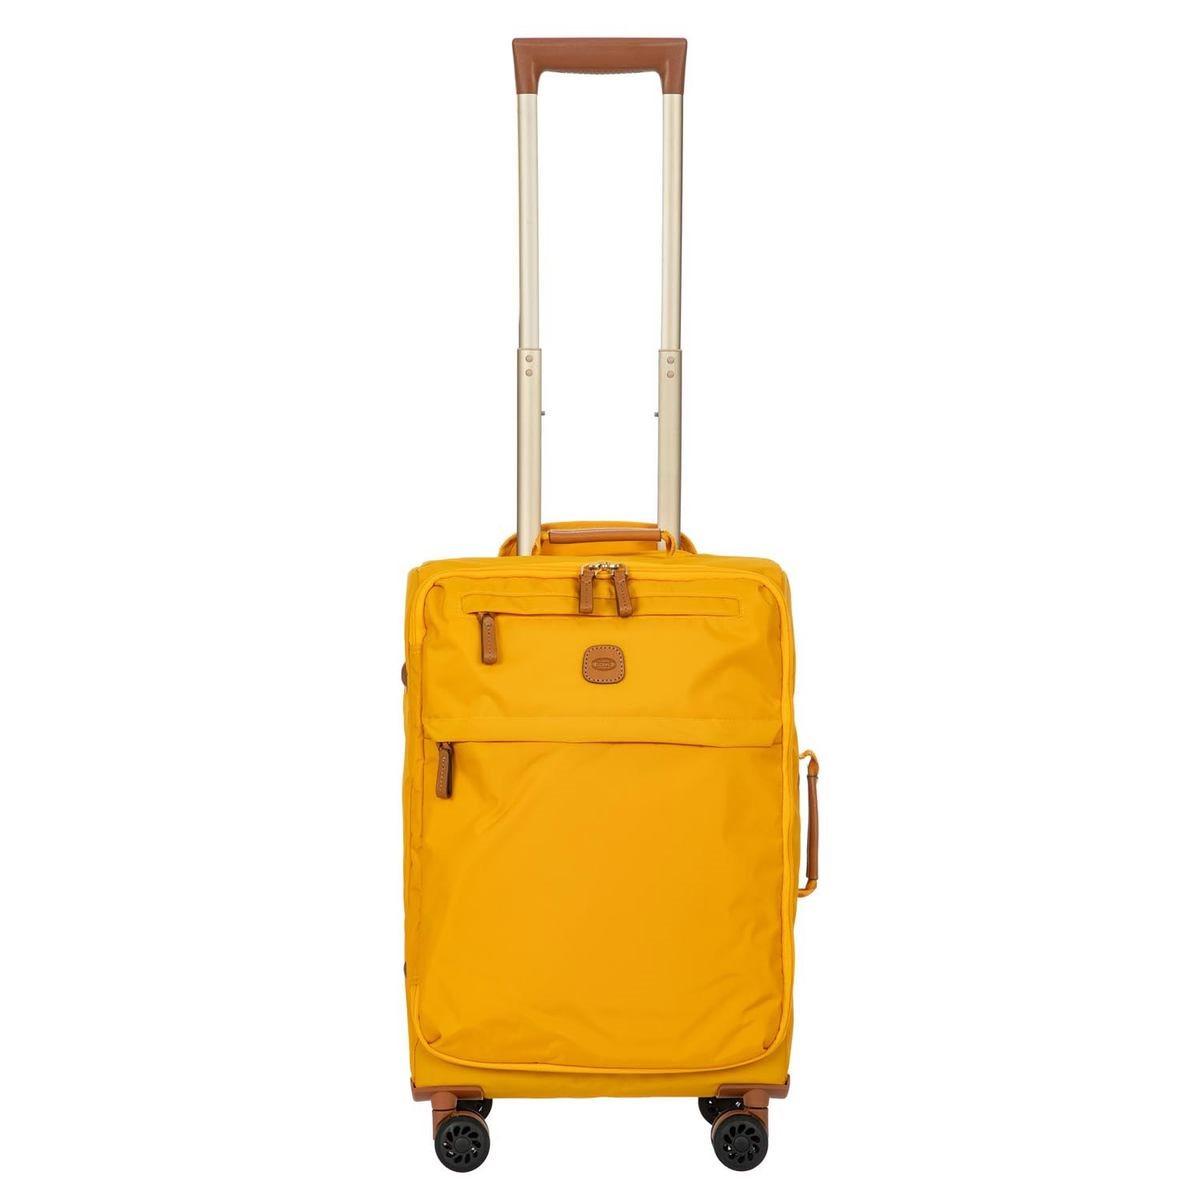 Brics Bαλίτσα Tροχήλατη Kαμπίνας 37x55x21cm Sειρά X-Travel Ocean Sun